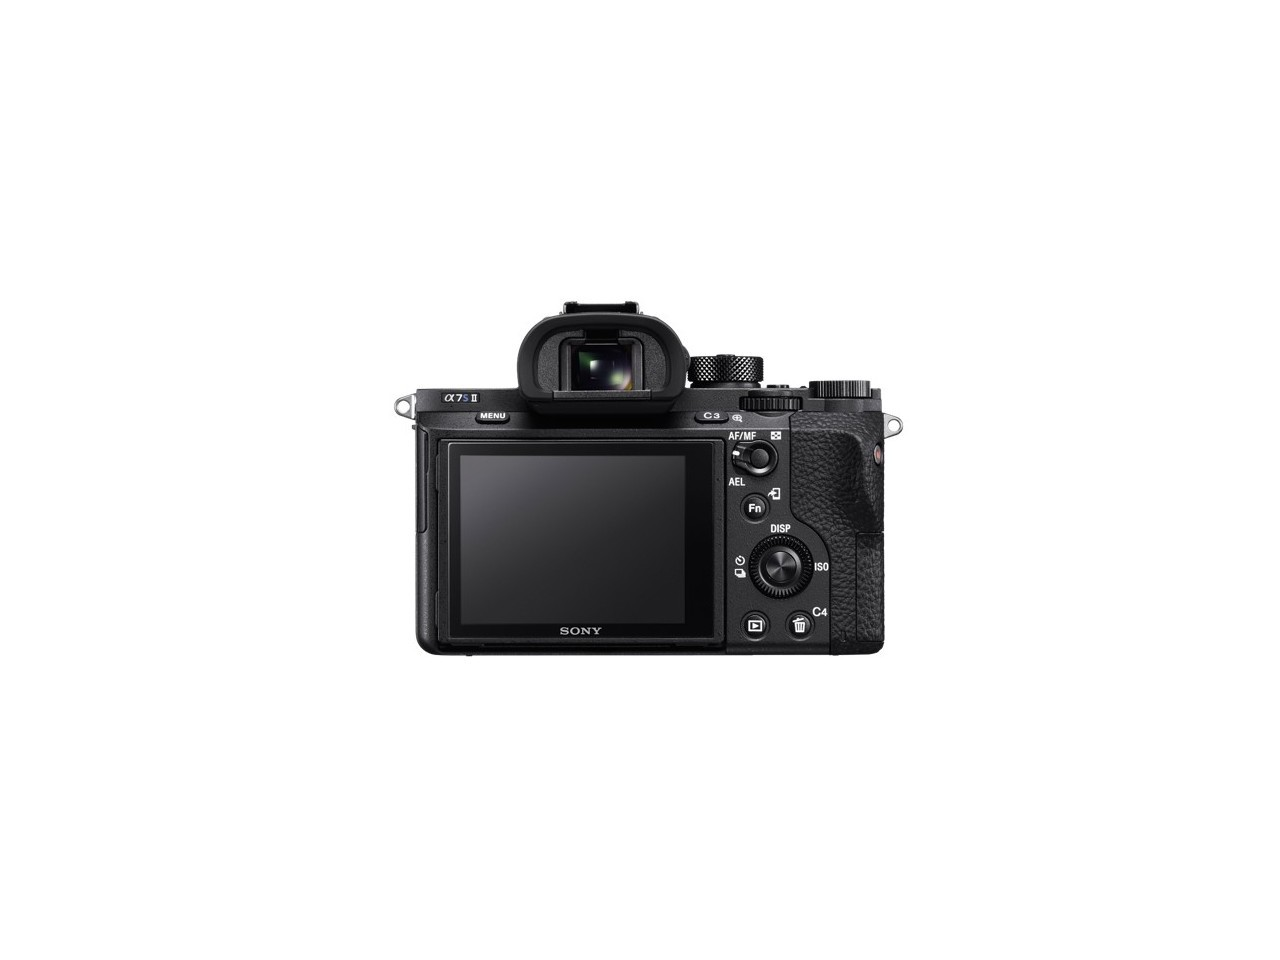 Sony Alpha ILCE-7SM2 купить в Sony Centre Воронеж